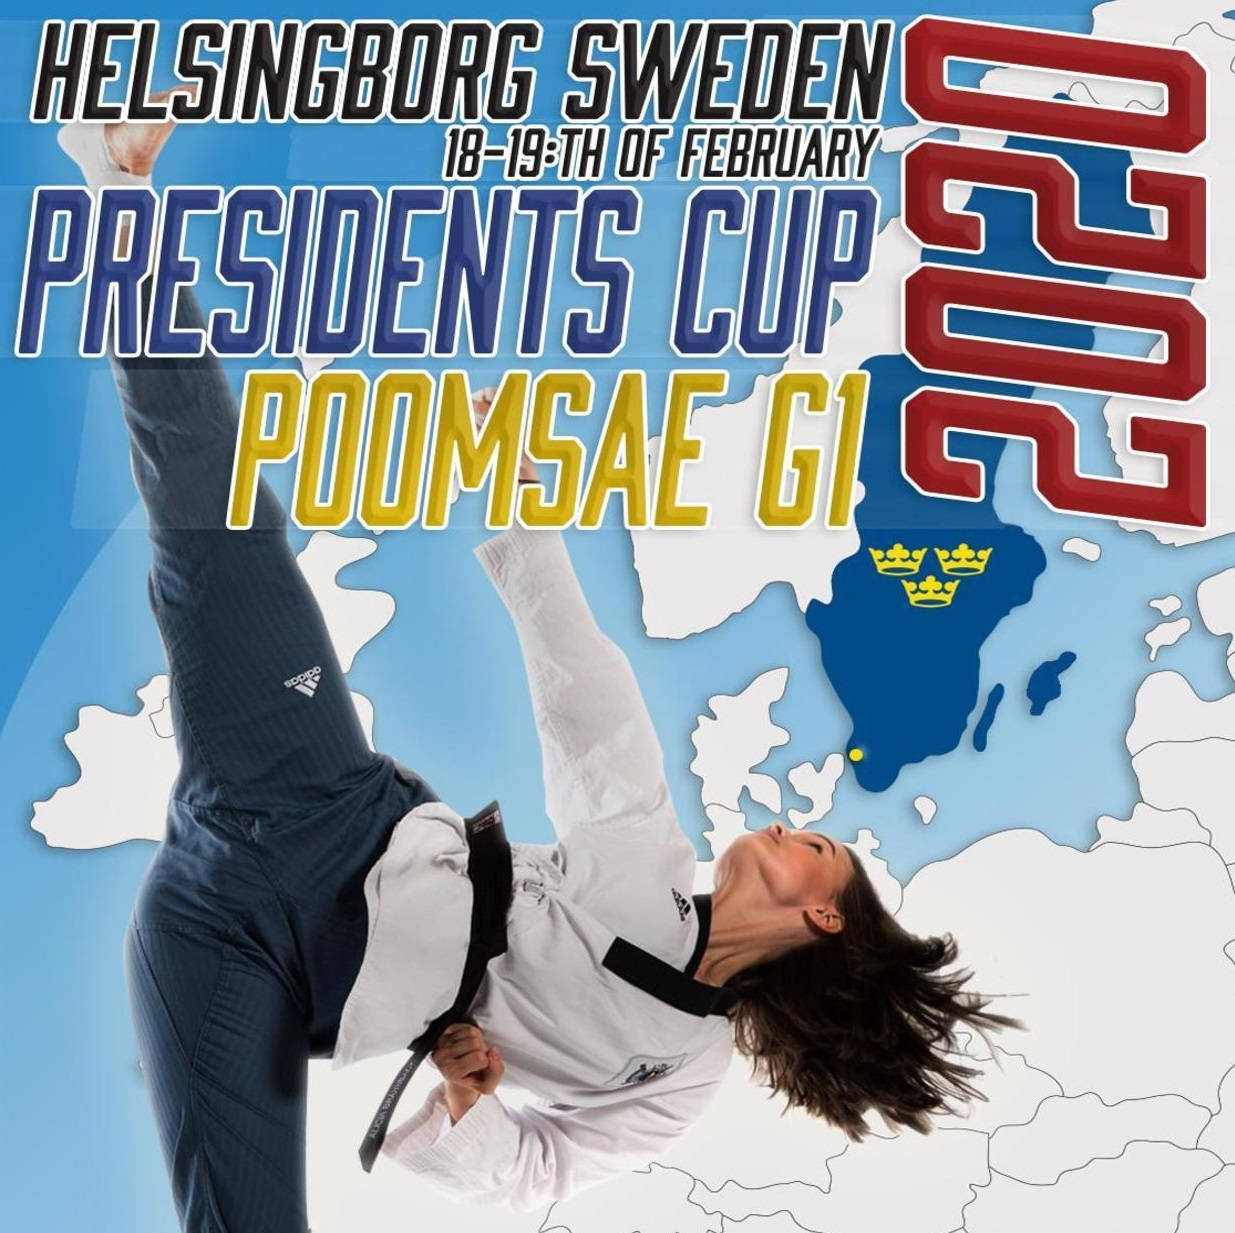 Foto: G1 Presidents Cup 2020 Poomsae